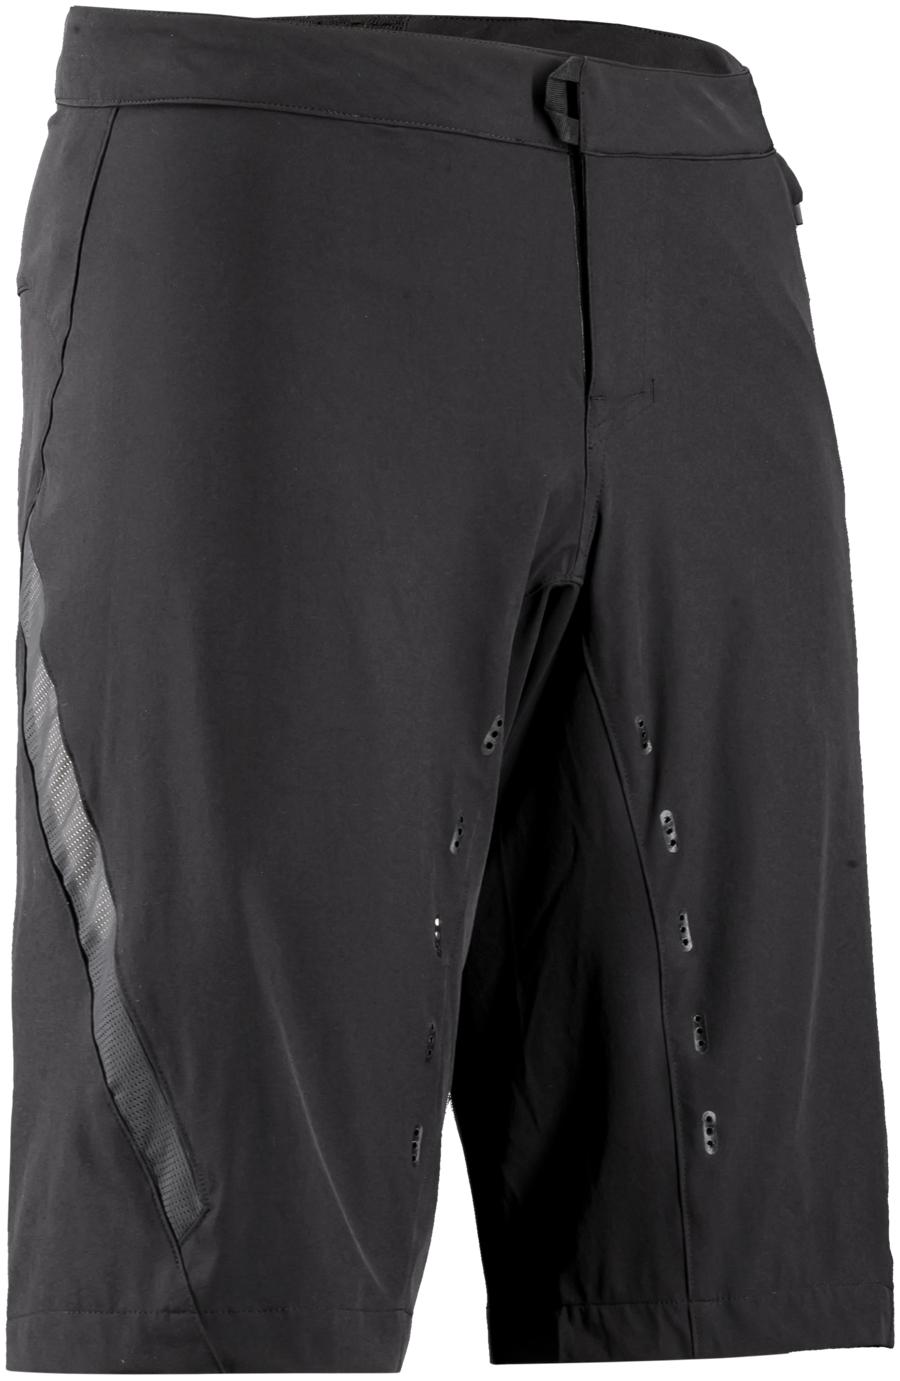 Bontrager Short Foray XL Black - Bontrager Short Foray XL Black